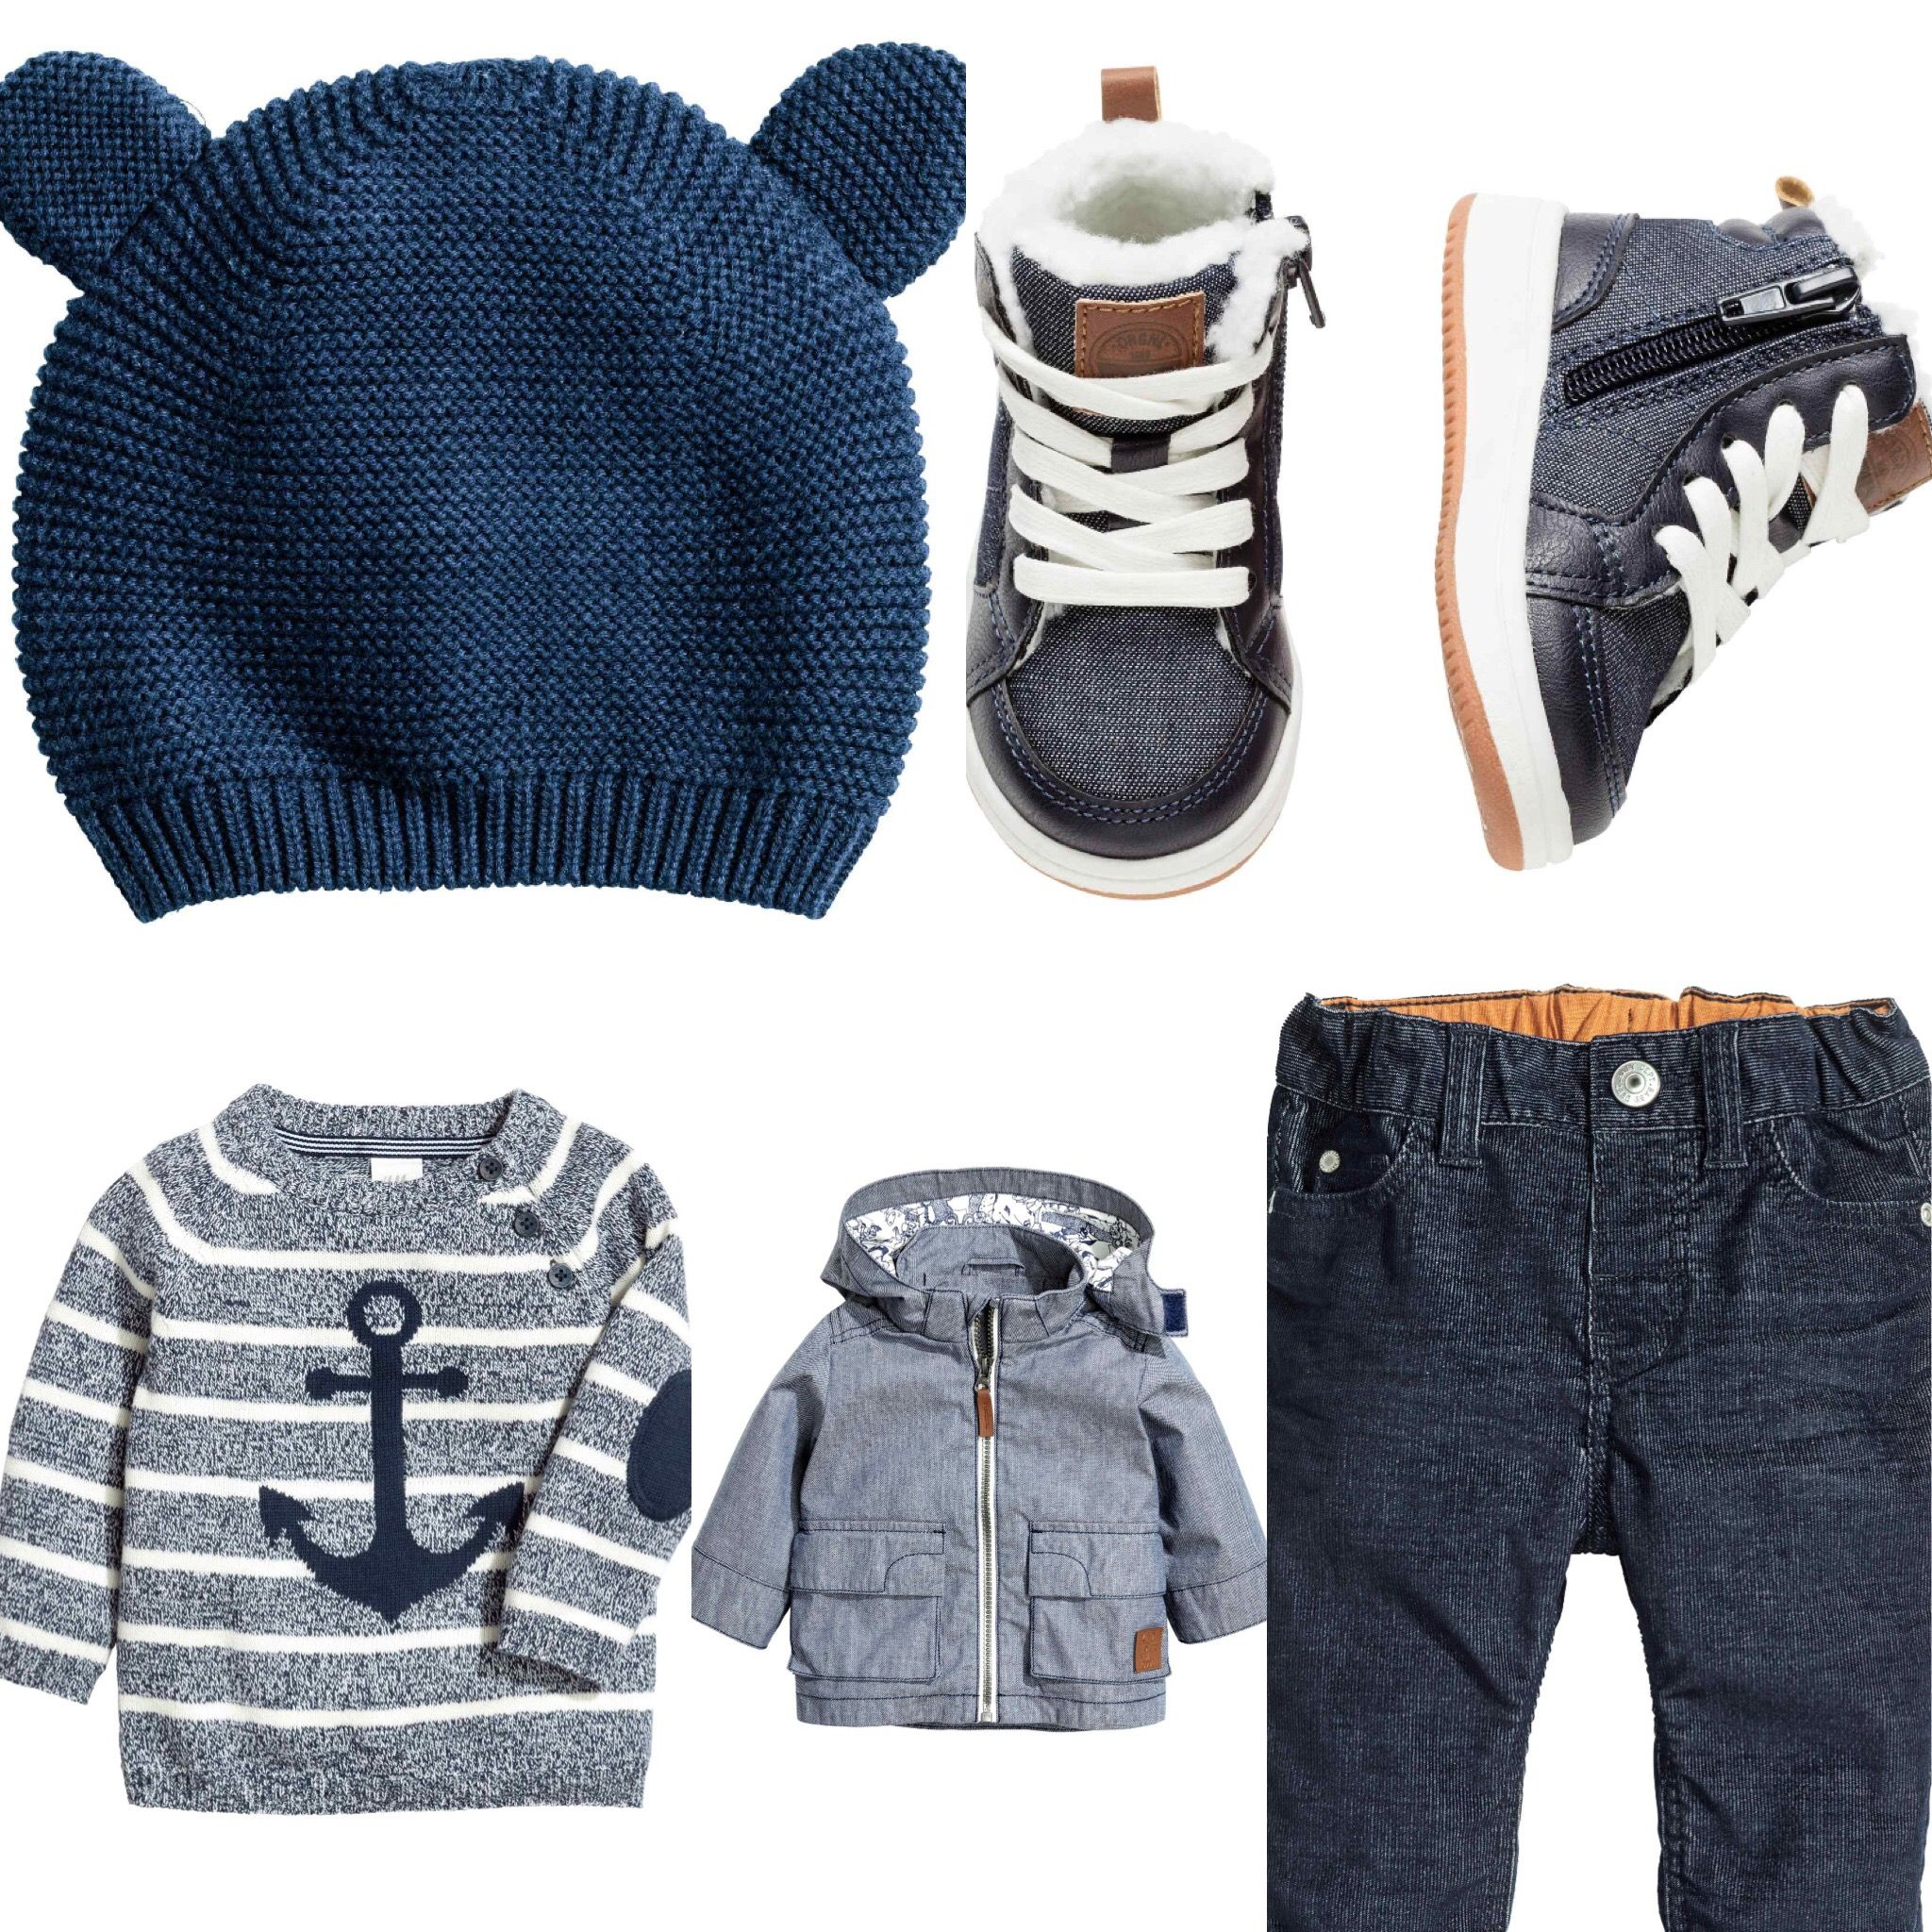 24a2e00a896a H M 2016 winter baby boy outfit idea. Navy sweater